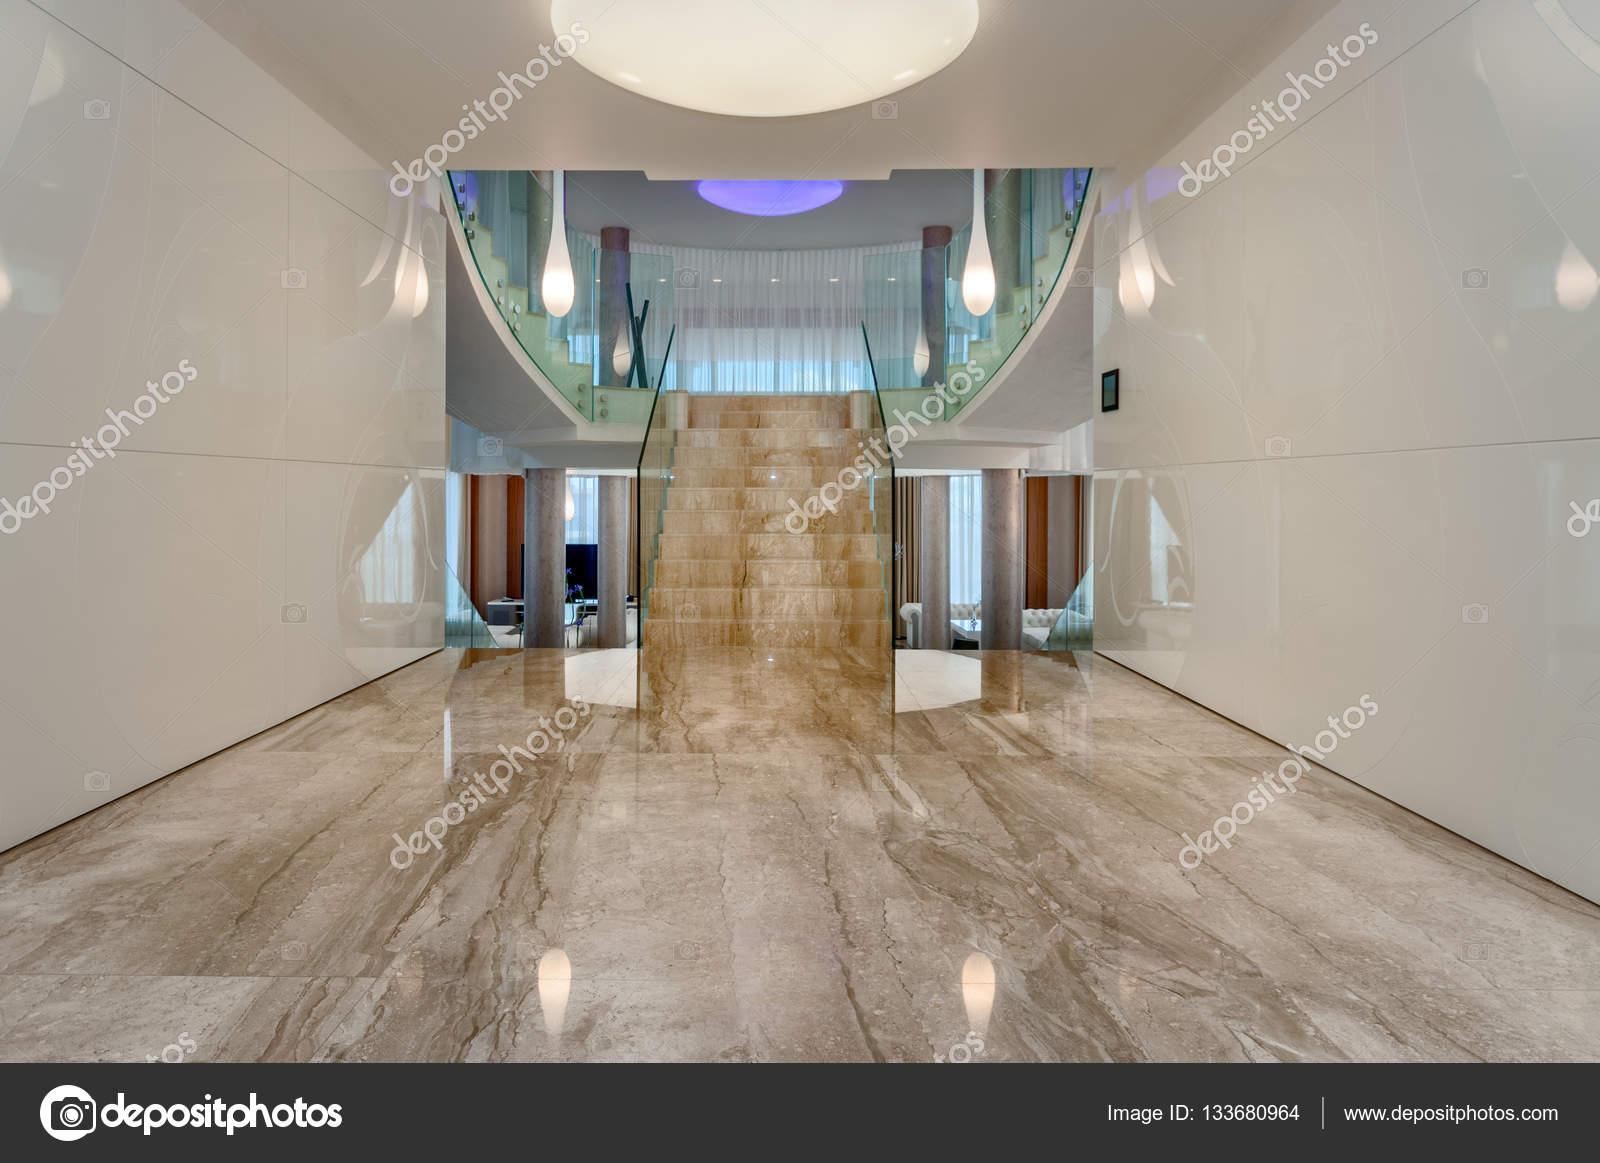 https://st3.depositphotos.com/2033345/13368/i/1600/depositphotos_133680964-stockafbeelding-moderne-marmeren-interieur-hal.jpg